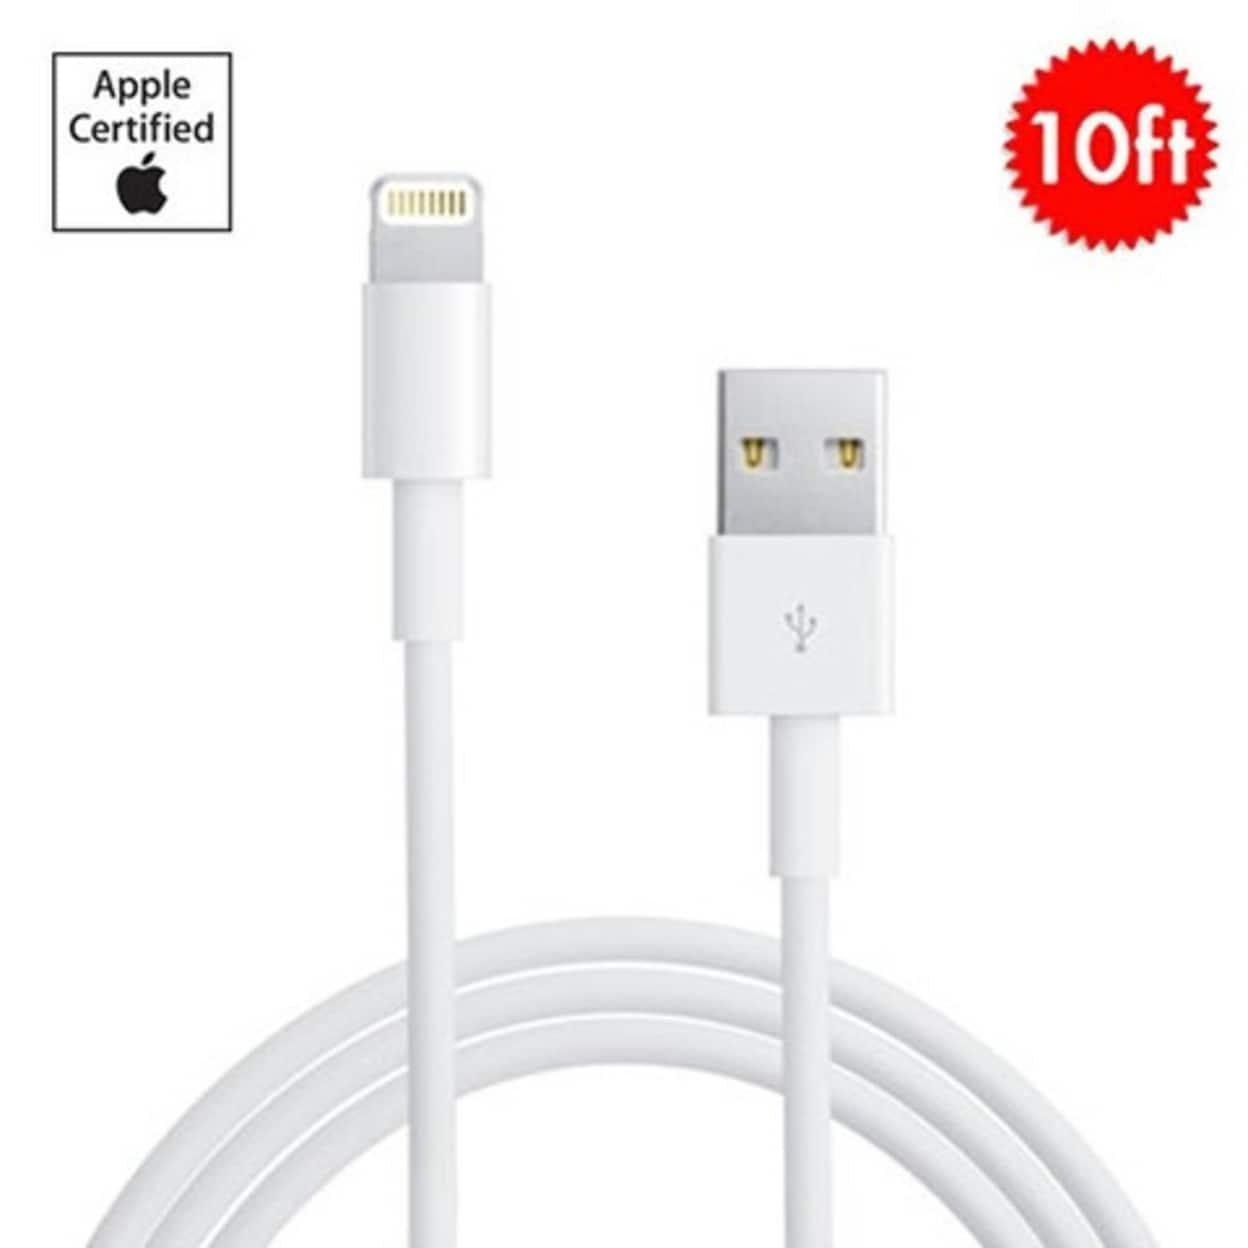 6 Feet OEM Genuine Apple USB Sync Data Charging Cord Cable